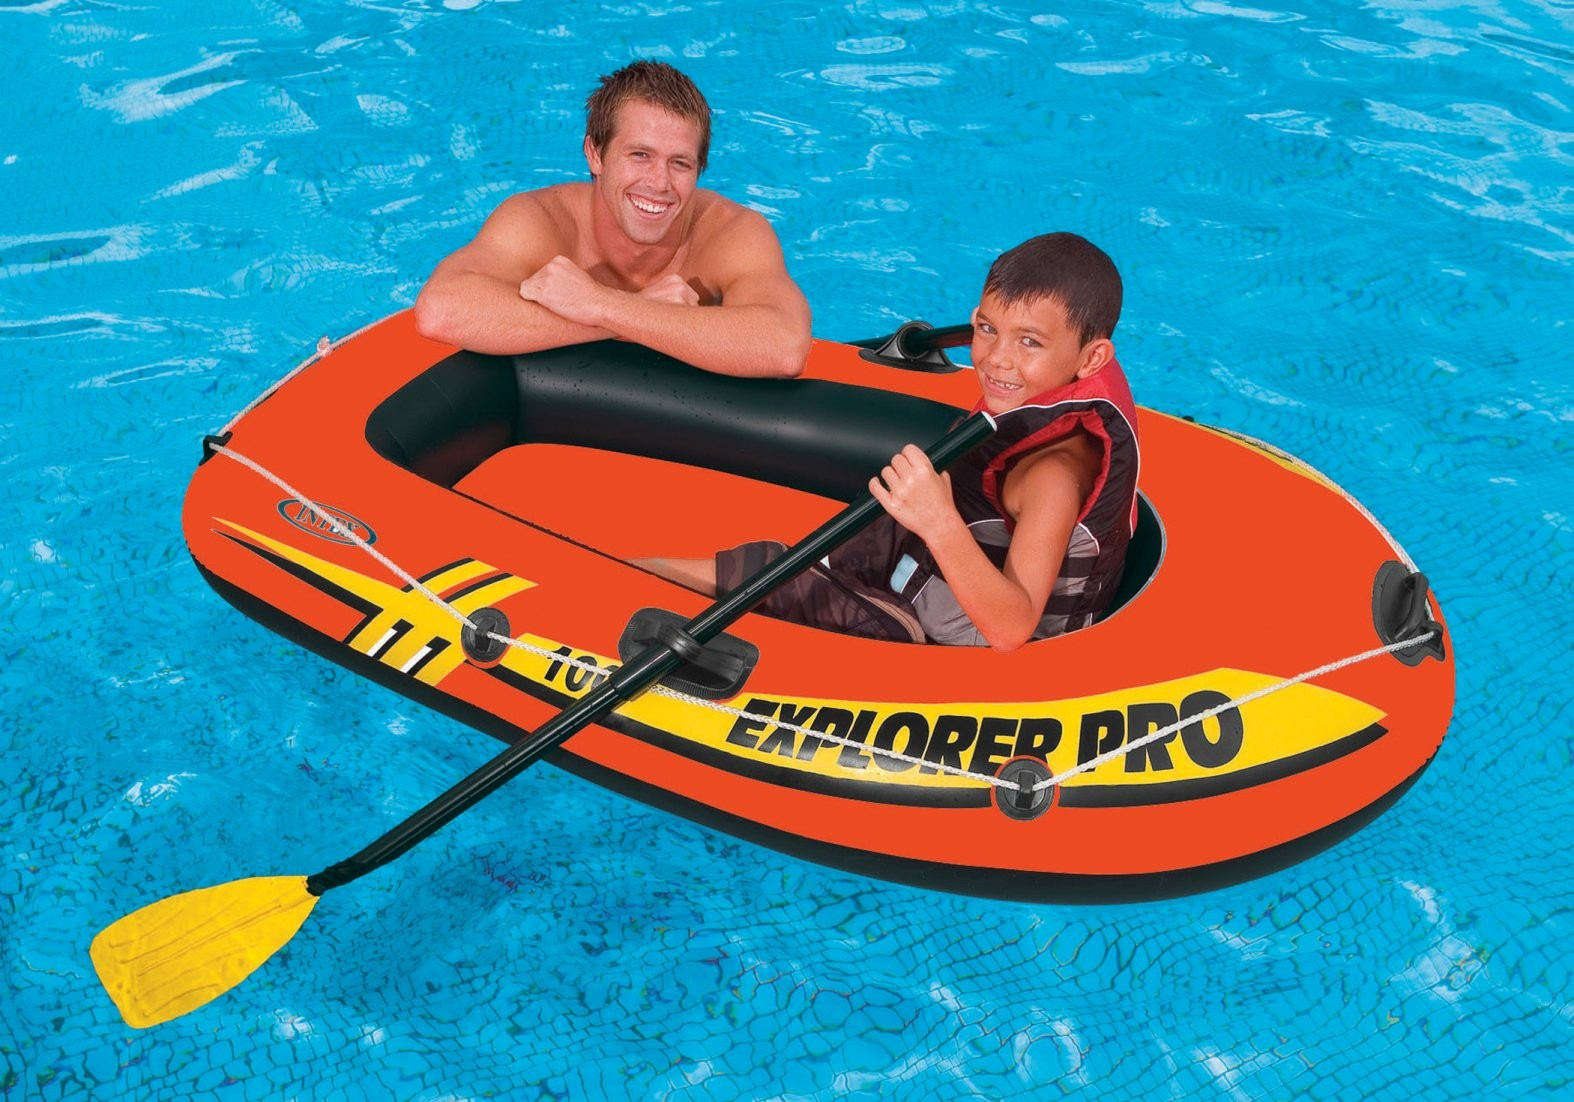 Thuyền bơm hơi trẻ em Explorer PRO 100 INTEX 58355